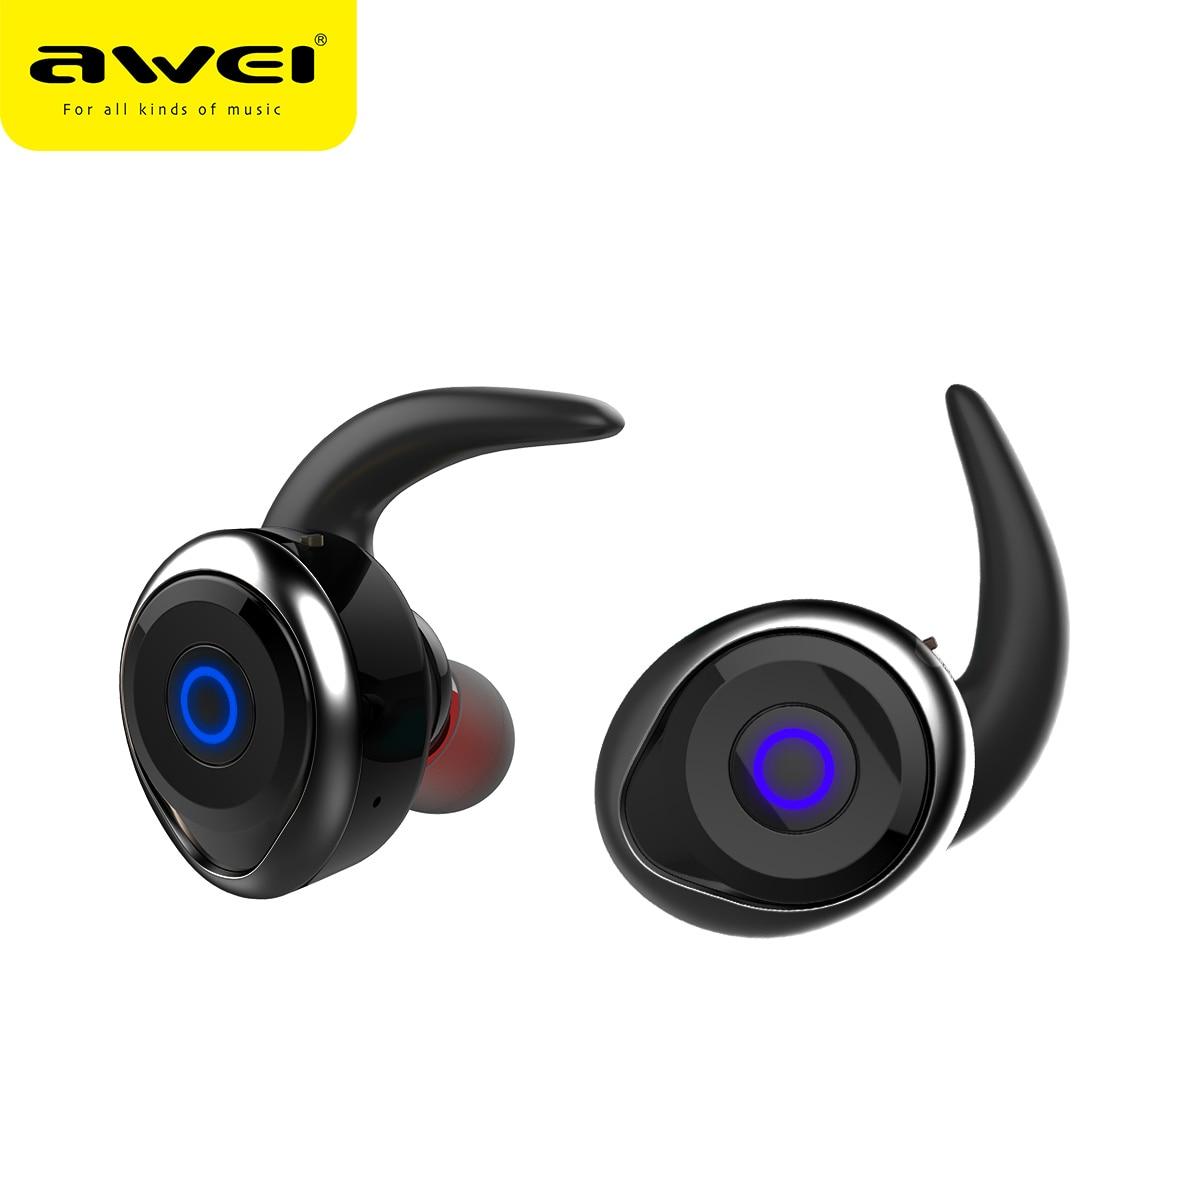 AWEI T1 TWS Bluetooth Headphones wireless Earphone Headset Double Wireless Earbuds Cordless Headphones Bluetooth V4.2